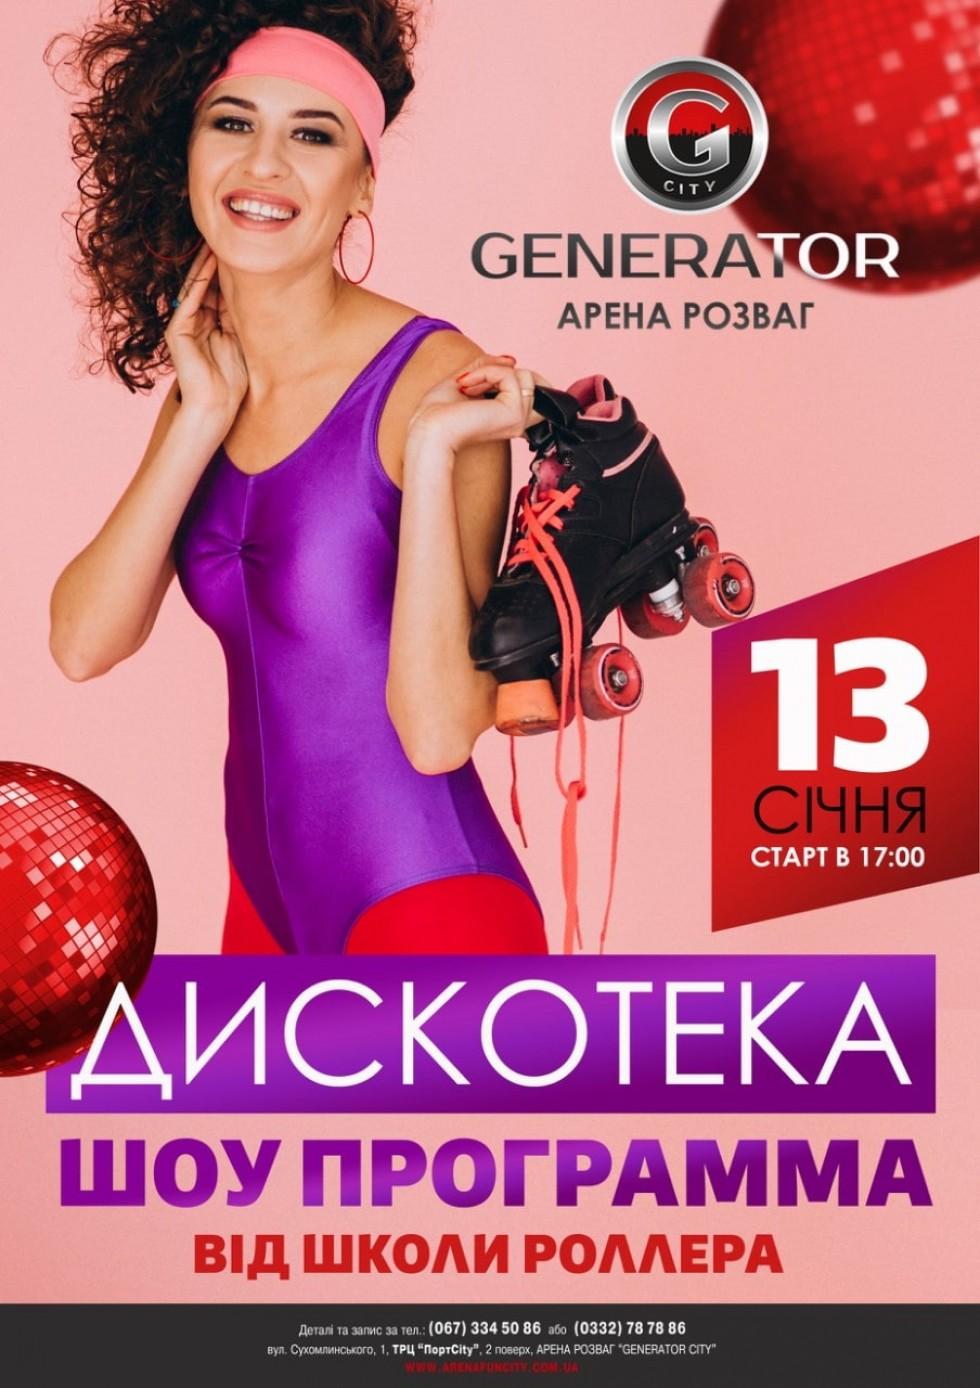 Шоу-програма та дискотека на роликах від GeneratorCity